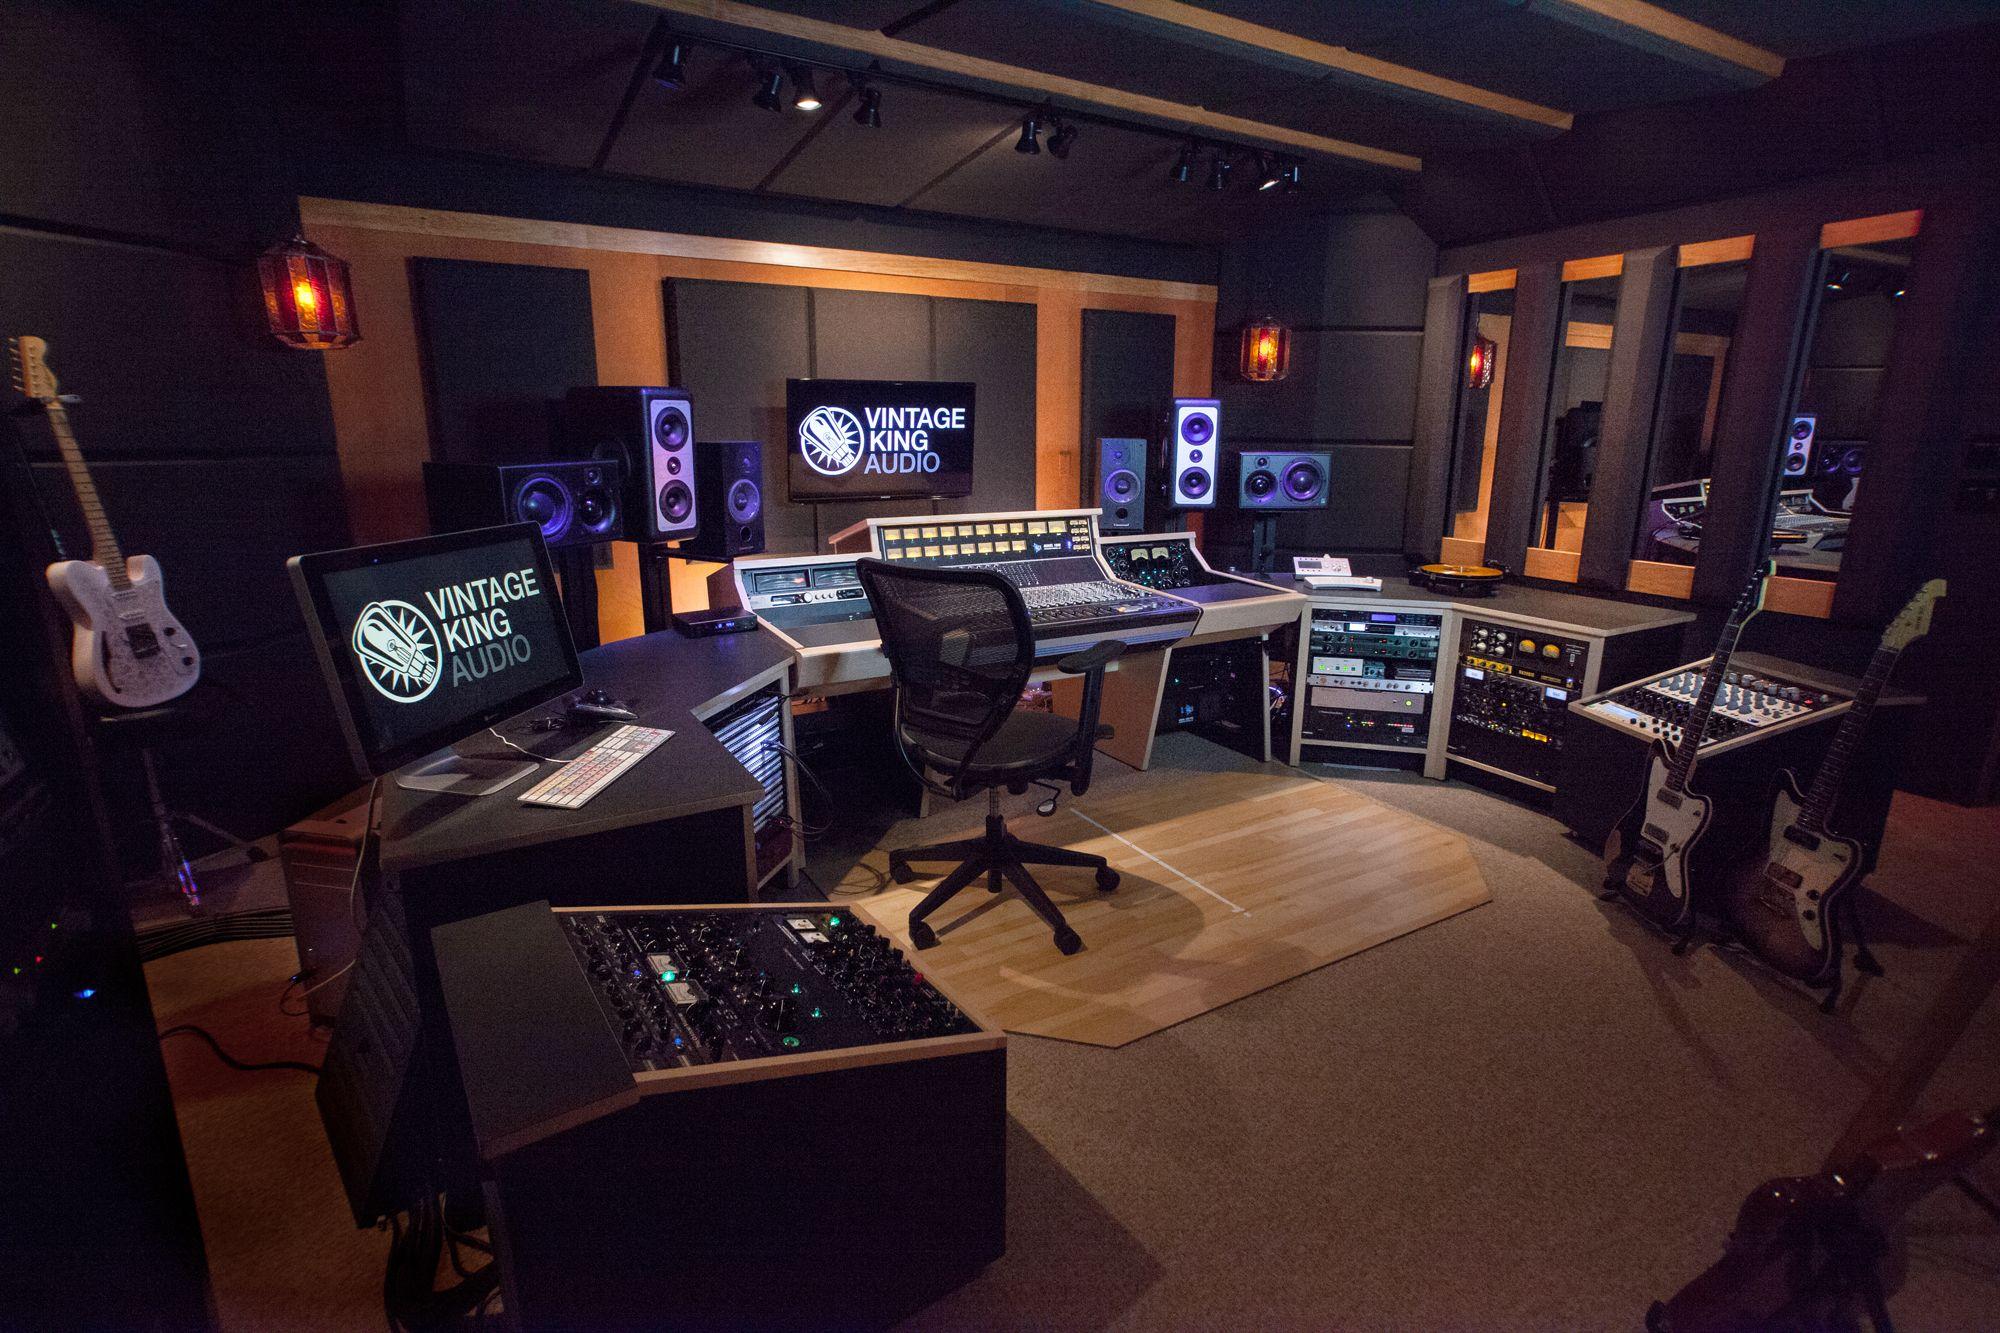 Vintage King Nashville Vintage King Audio The Recording Studio